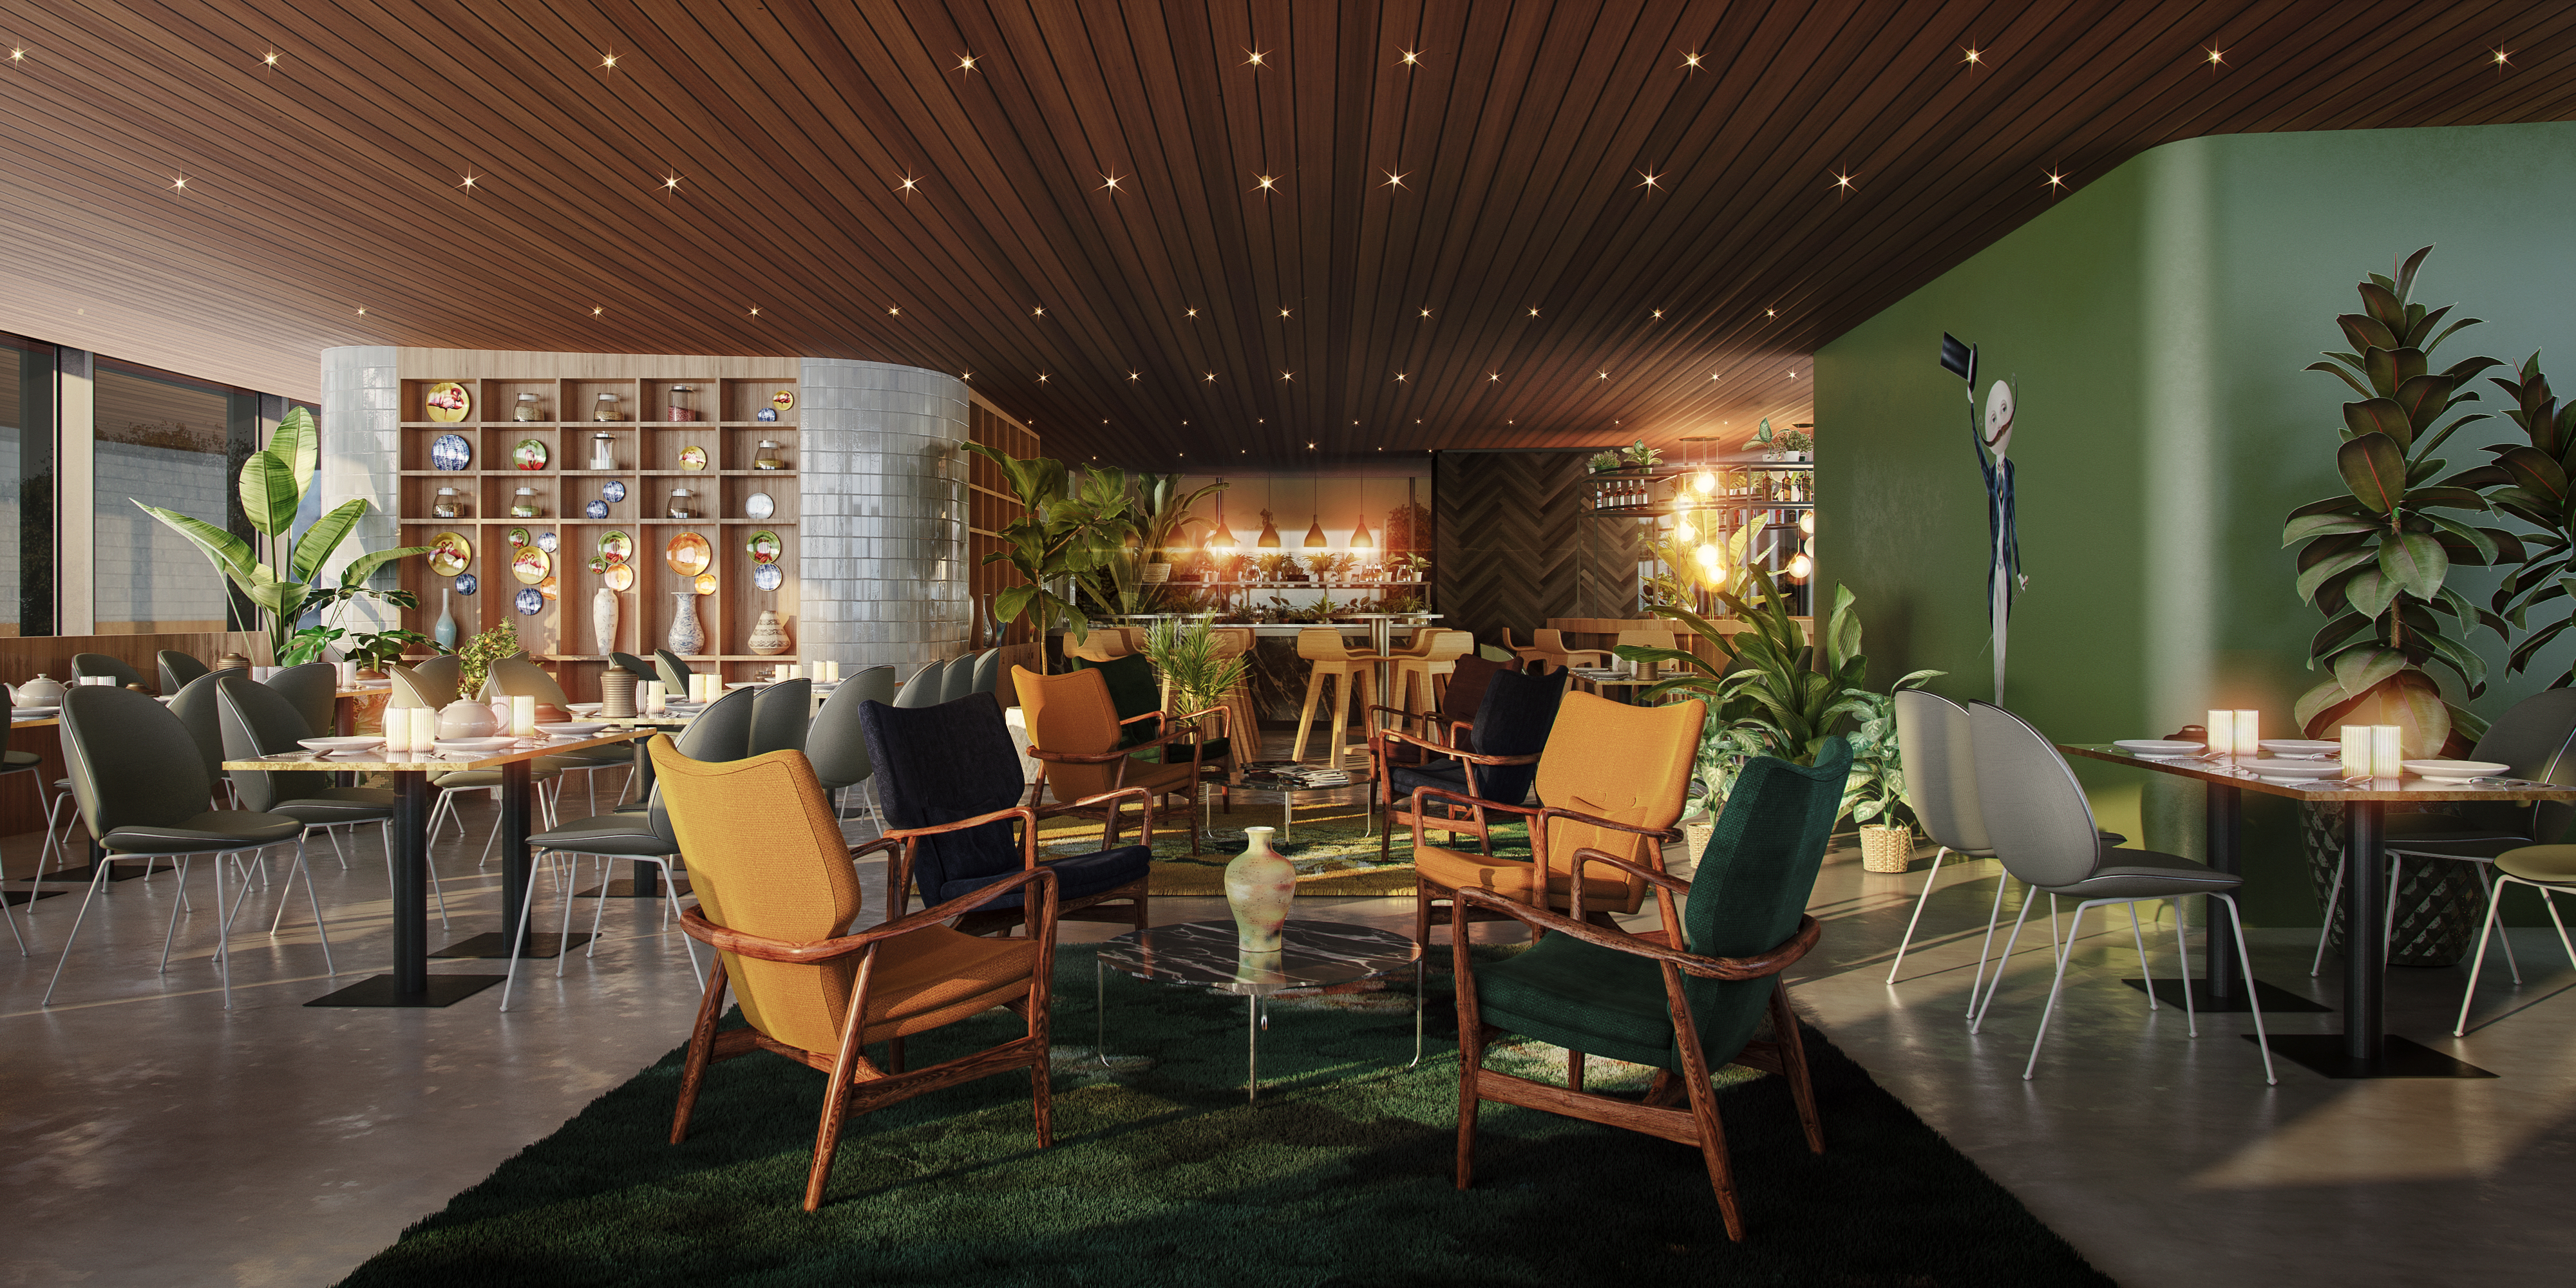 <p>Interieur bovenverdieping restaurant. Beeld: Powerhouse Company</p>